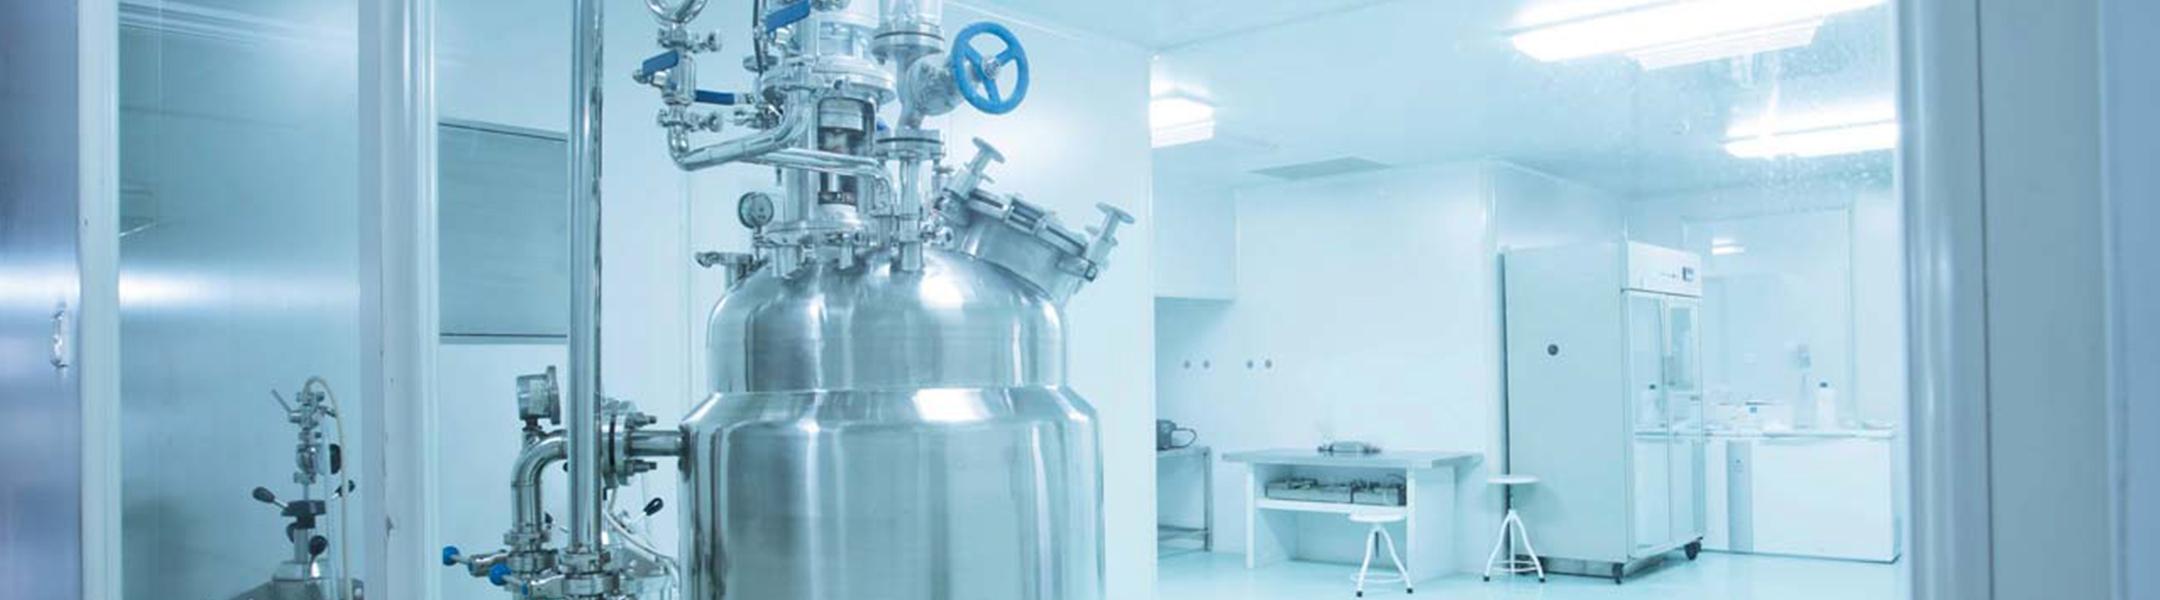 pavimentazioni industria chimica